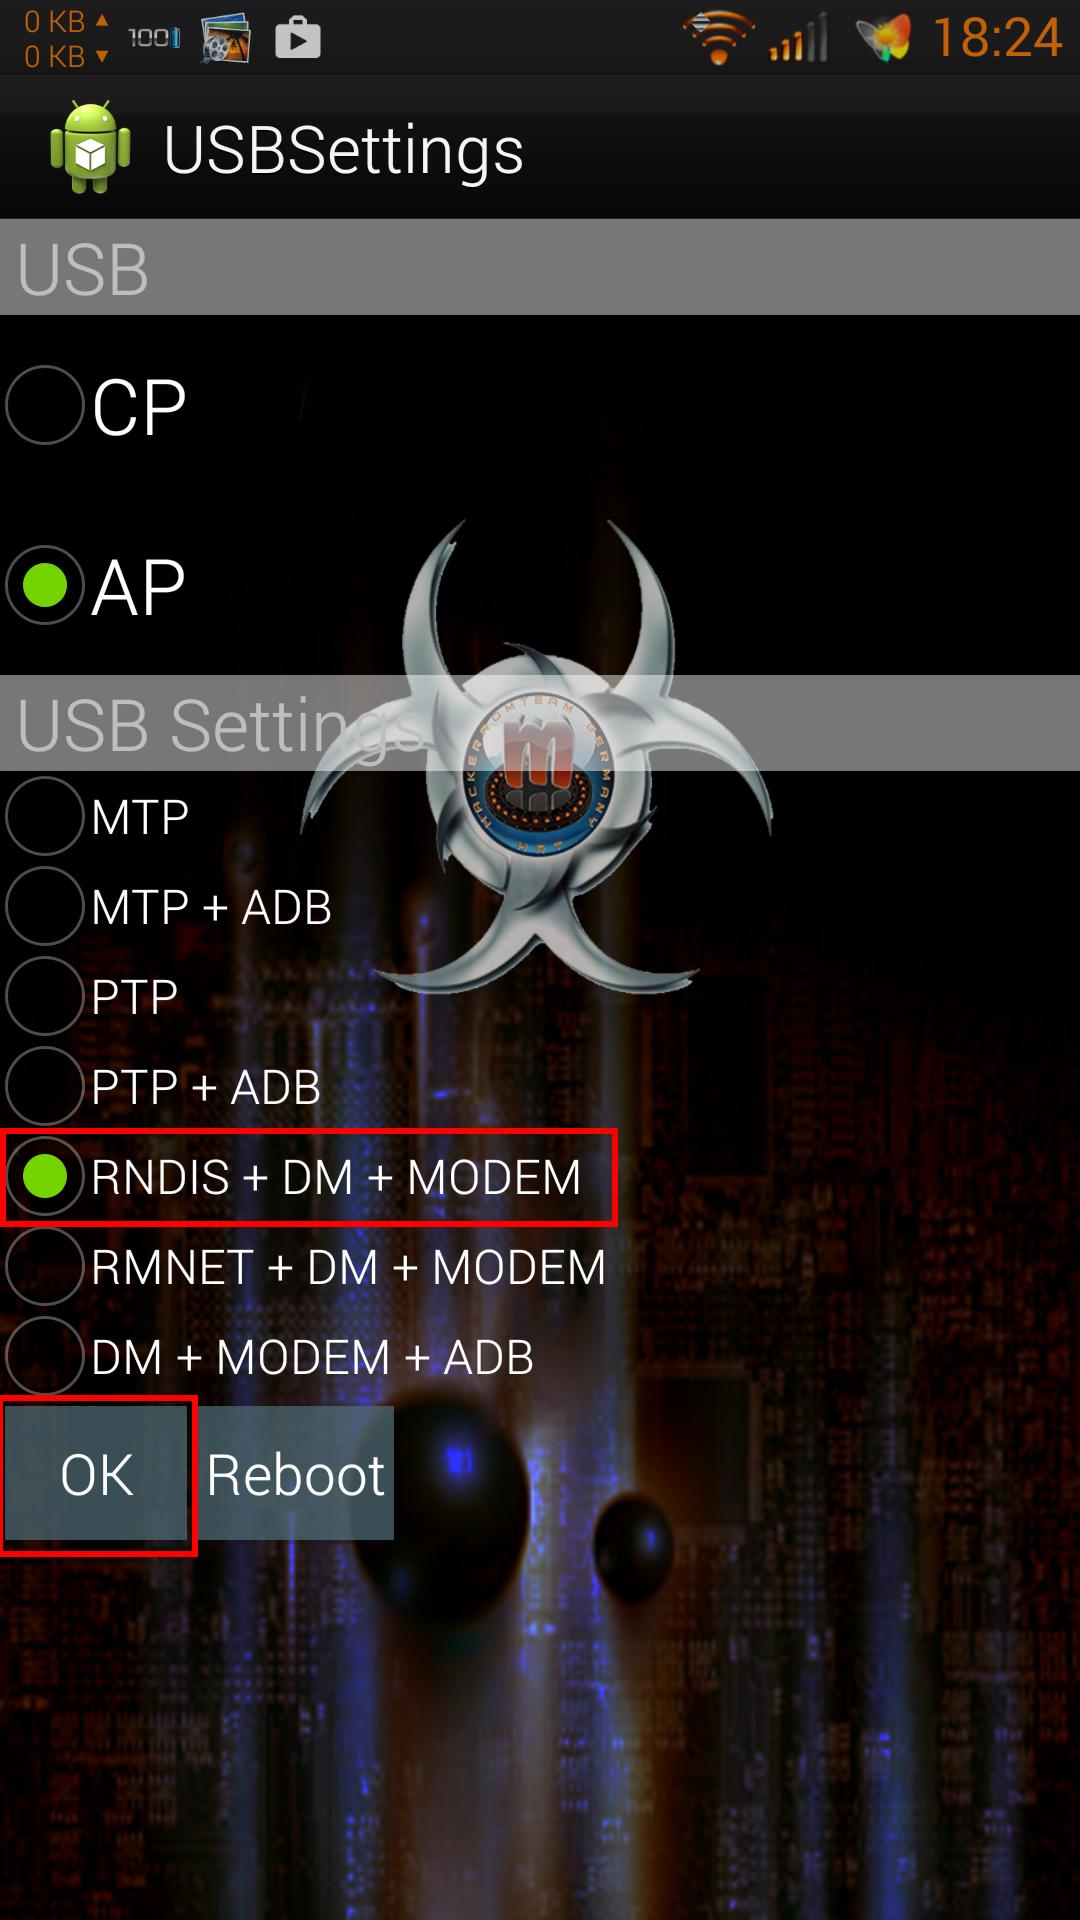 [Anleitungen] Erstellen eines EFS/NV Data Backup - Galaxy Note 4-screenshot_2014-11-05-18-24-09.png